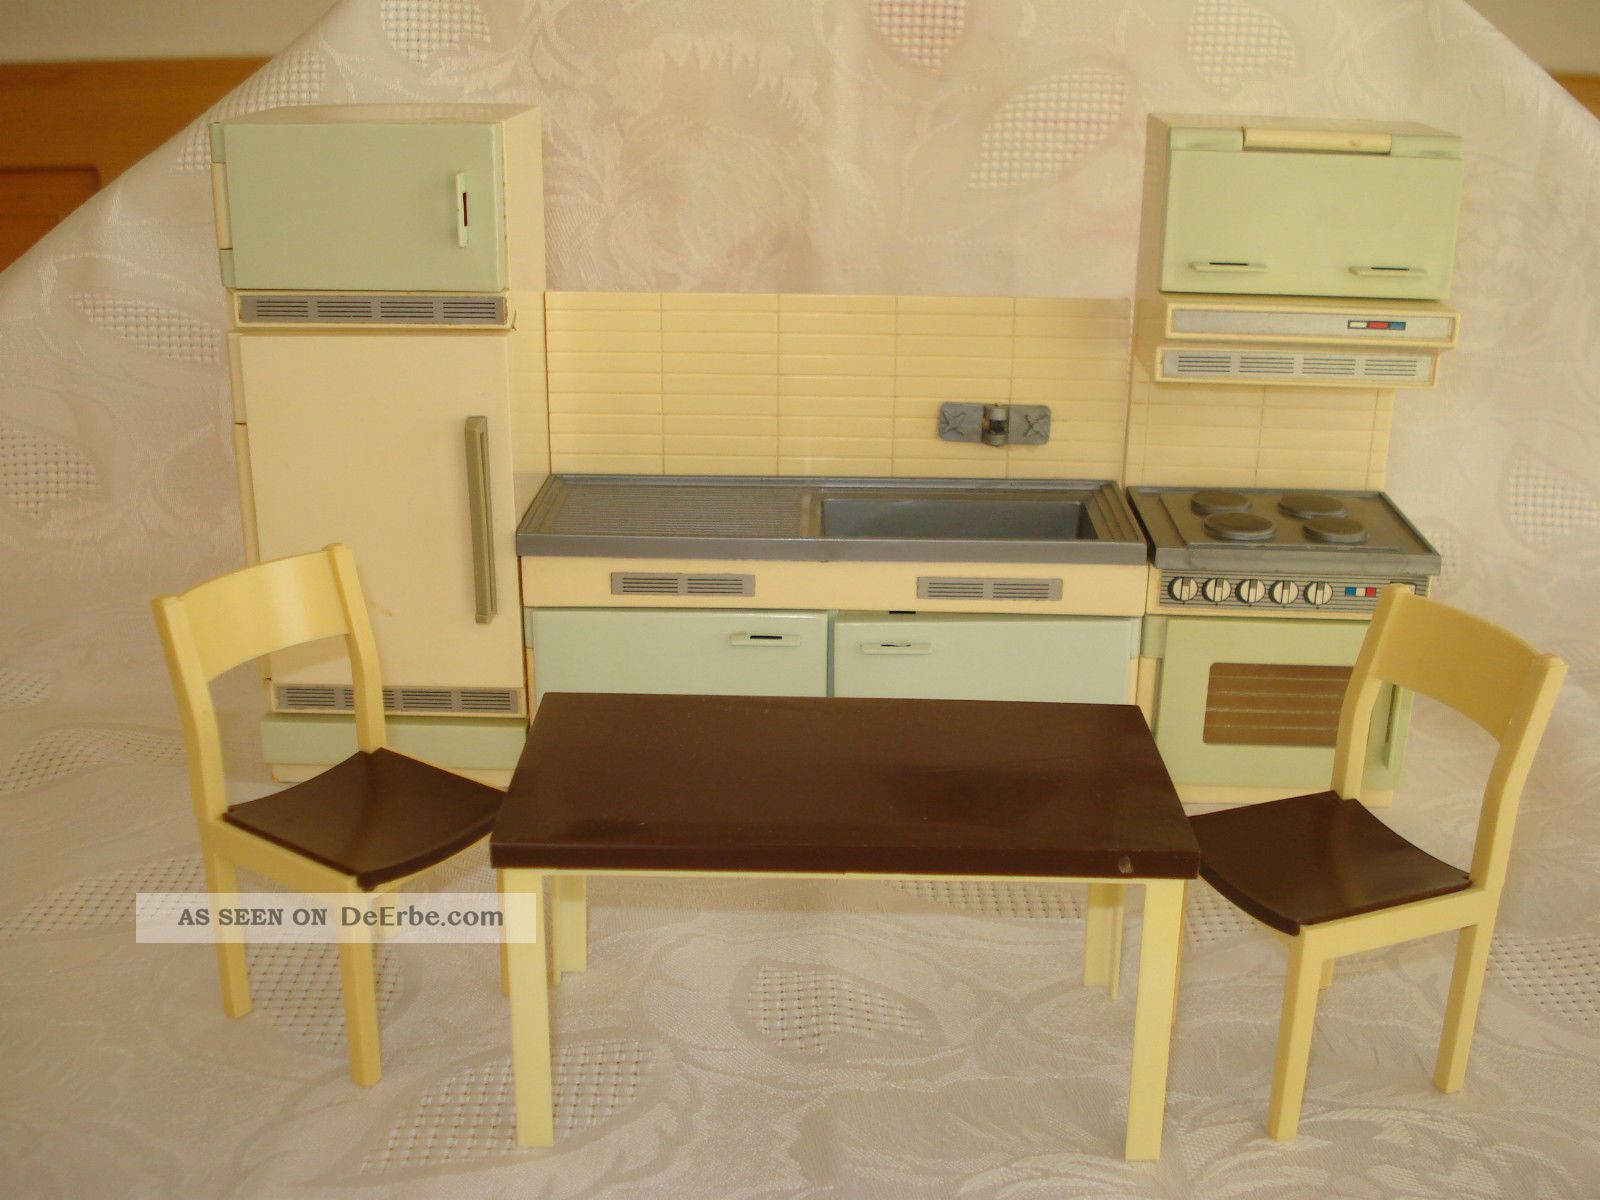 puppenhaus k che 60er 70er jahre k hlschrank sp le herd tisch und st hle. Black Bedroom Furniture Sets. Home Design Ideas